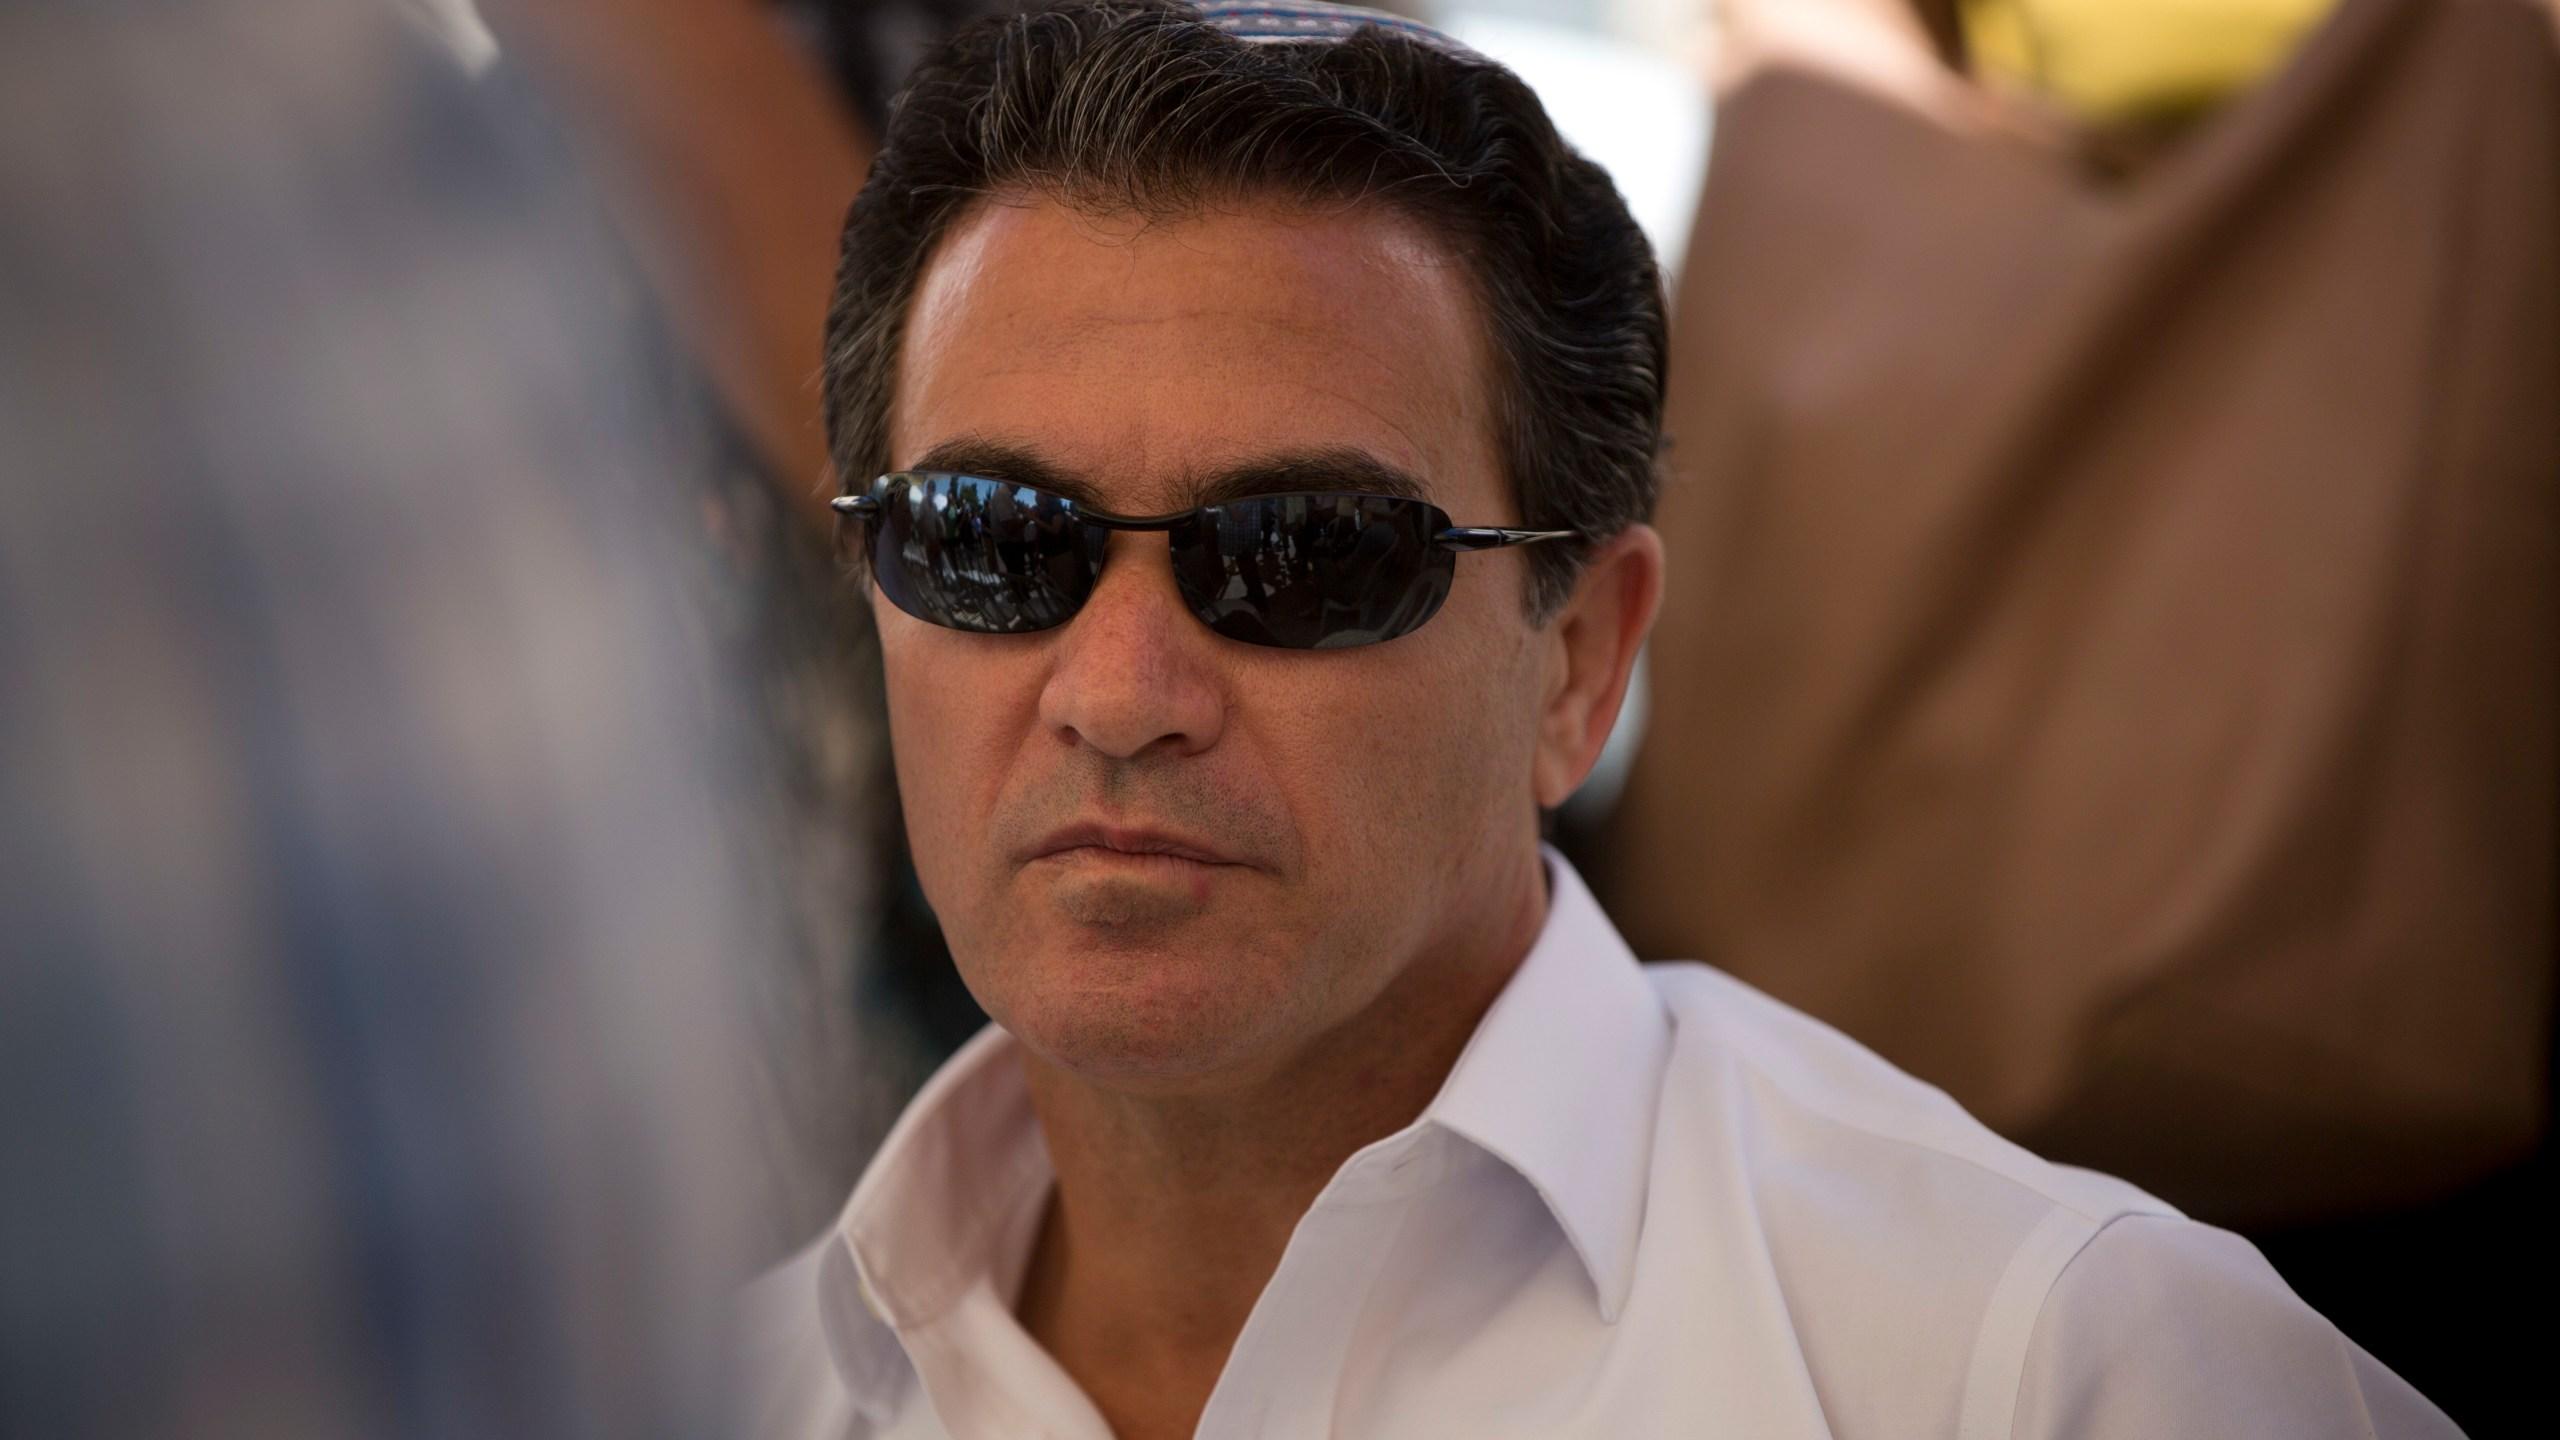 Yossi Cohen